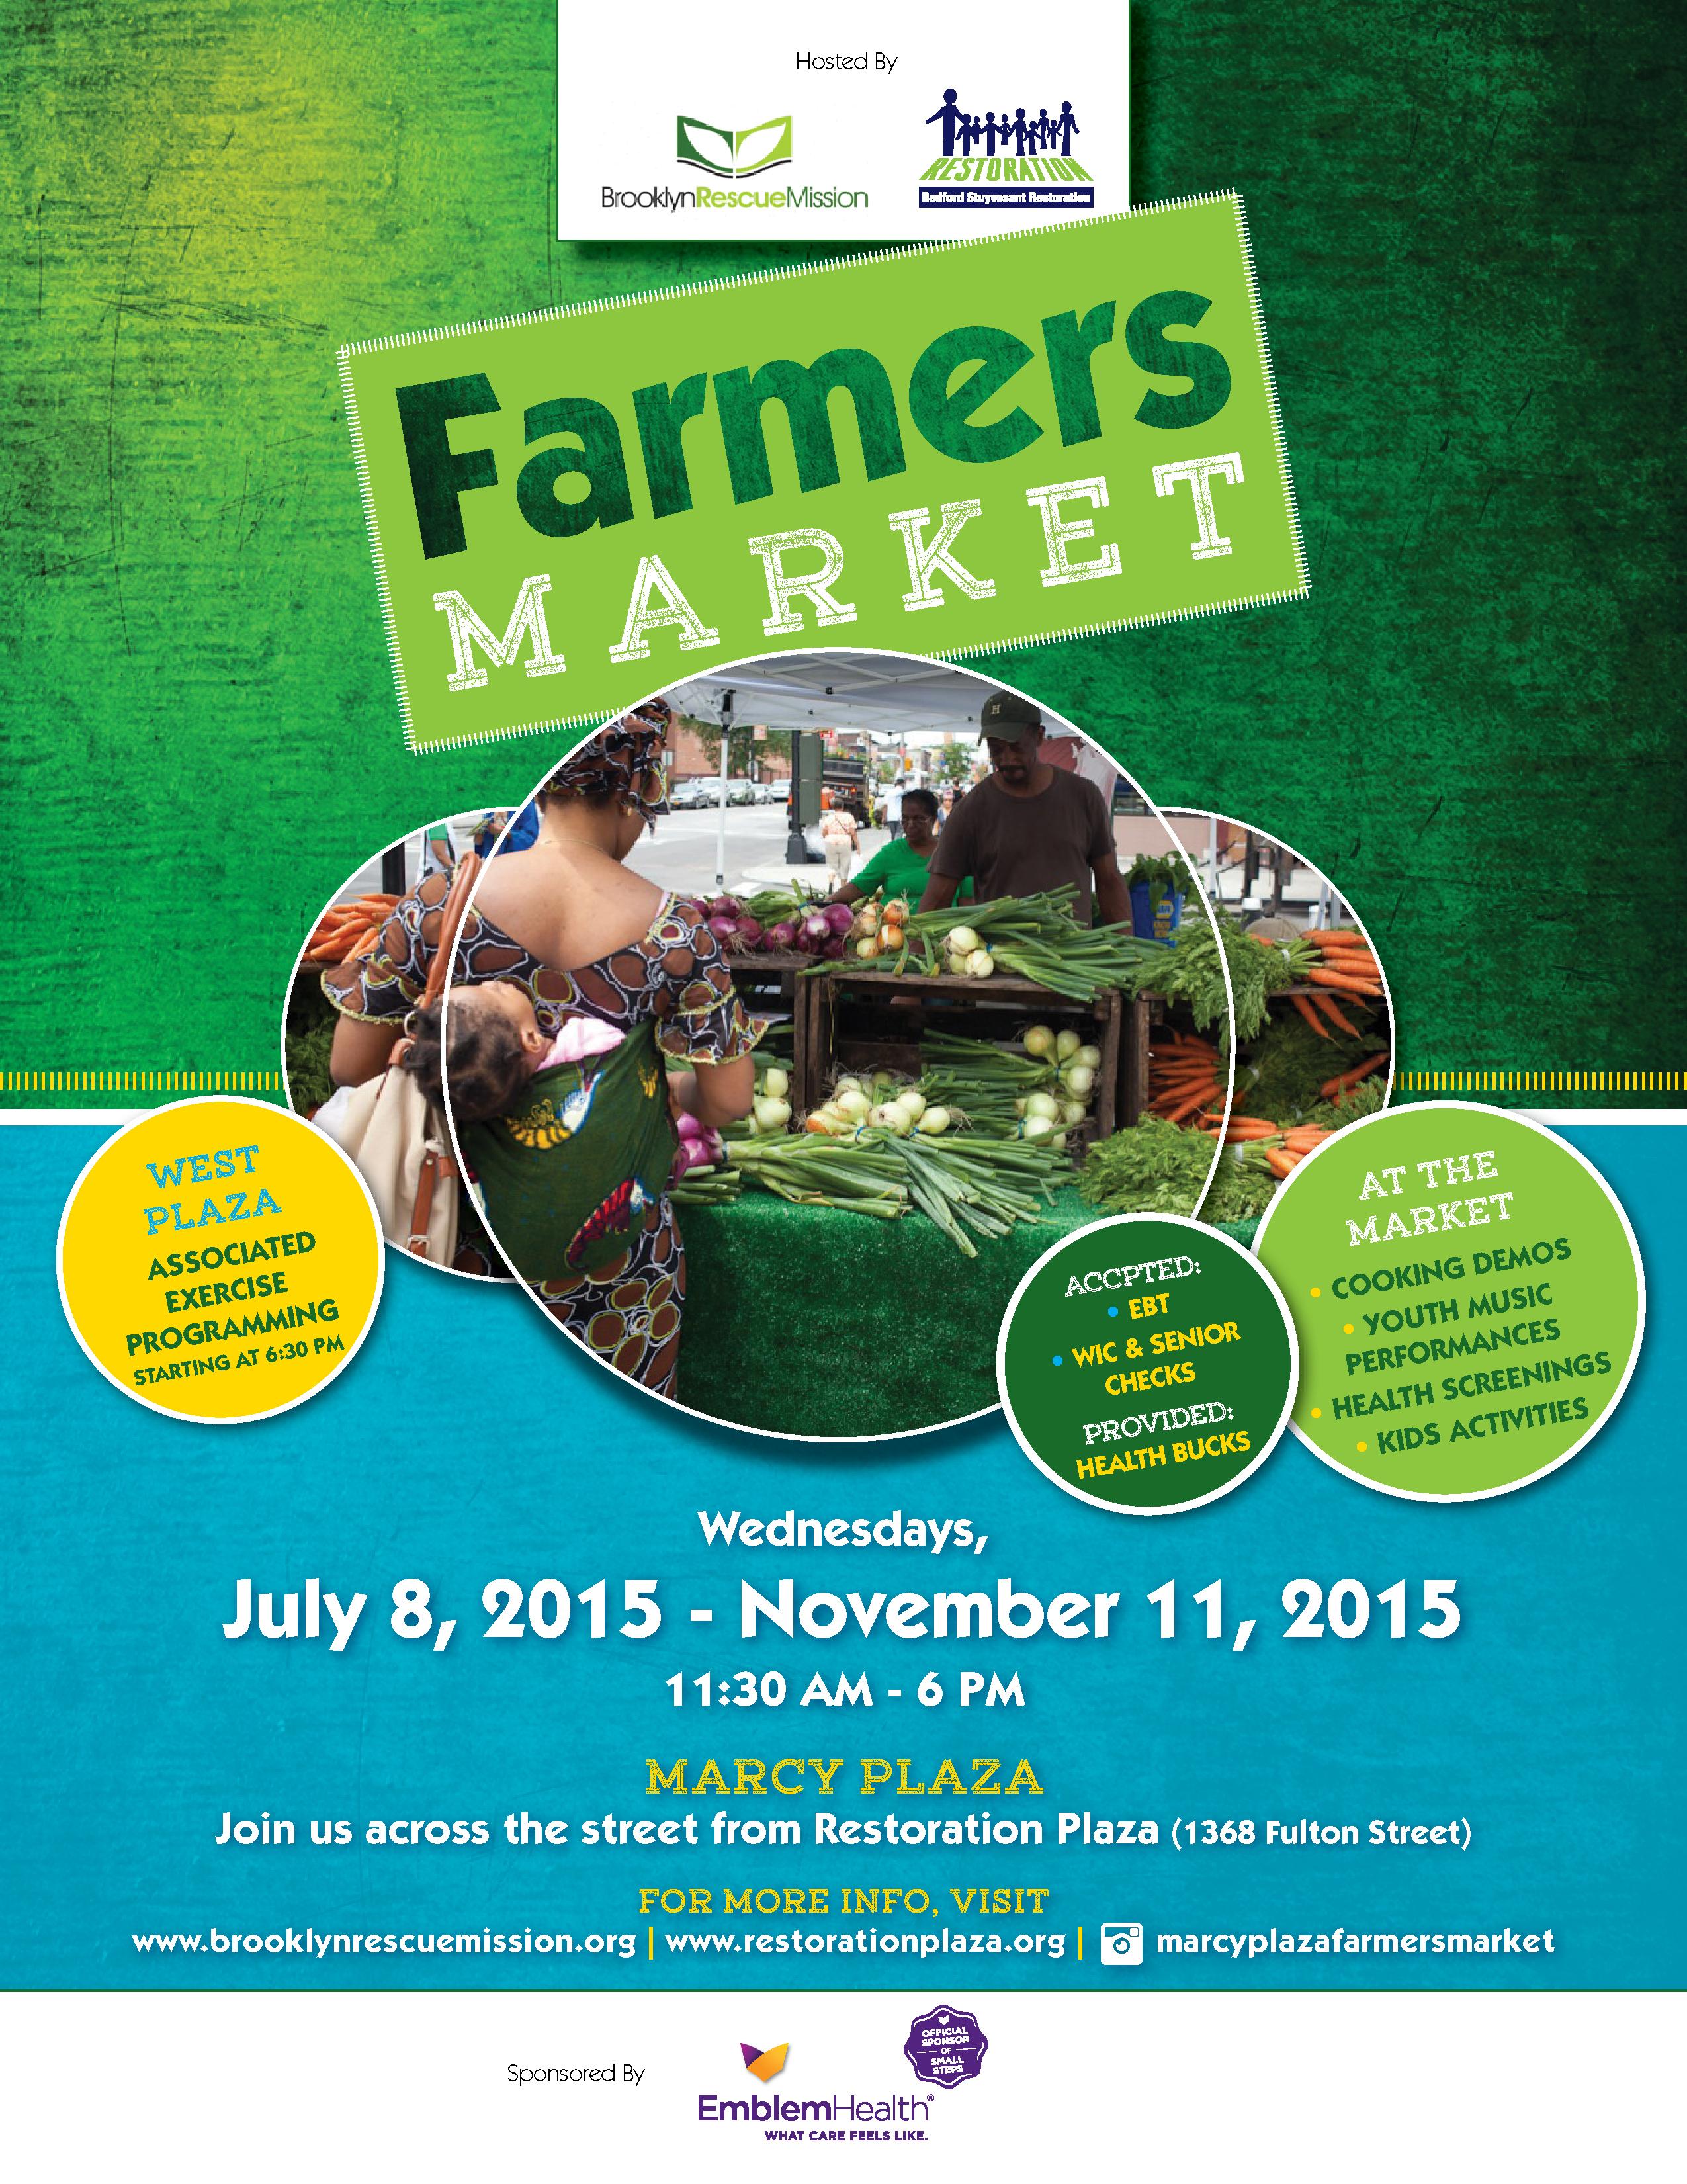 Marcy Plaza Farmers Market Flyer 2015